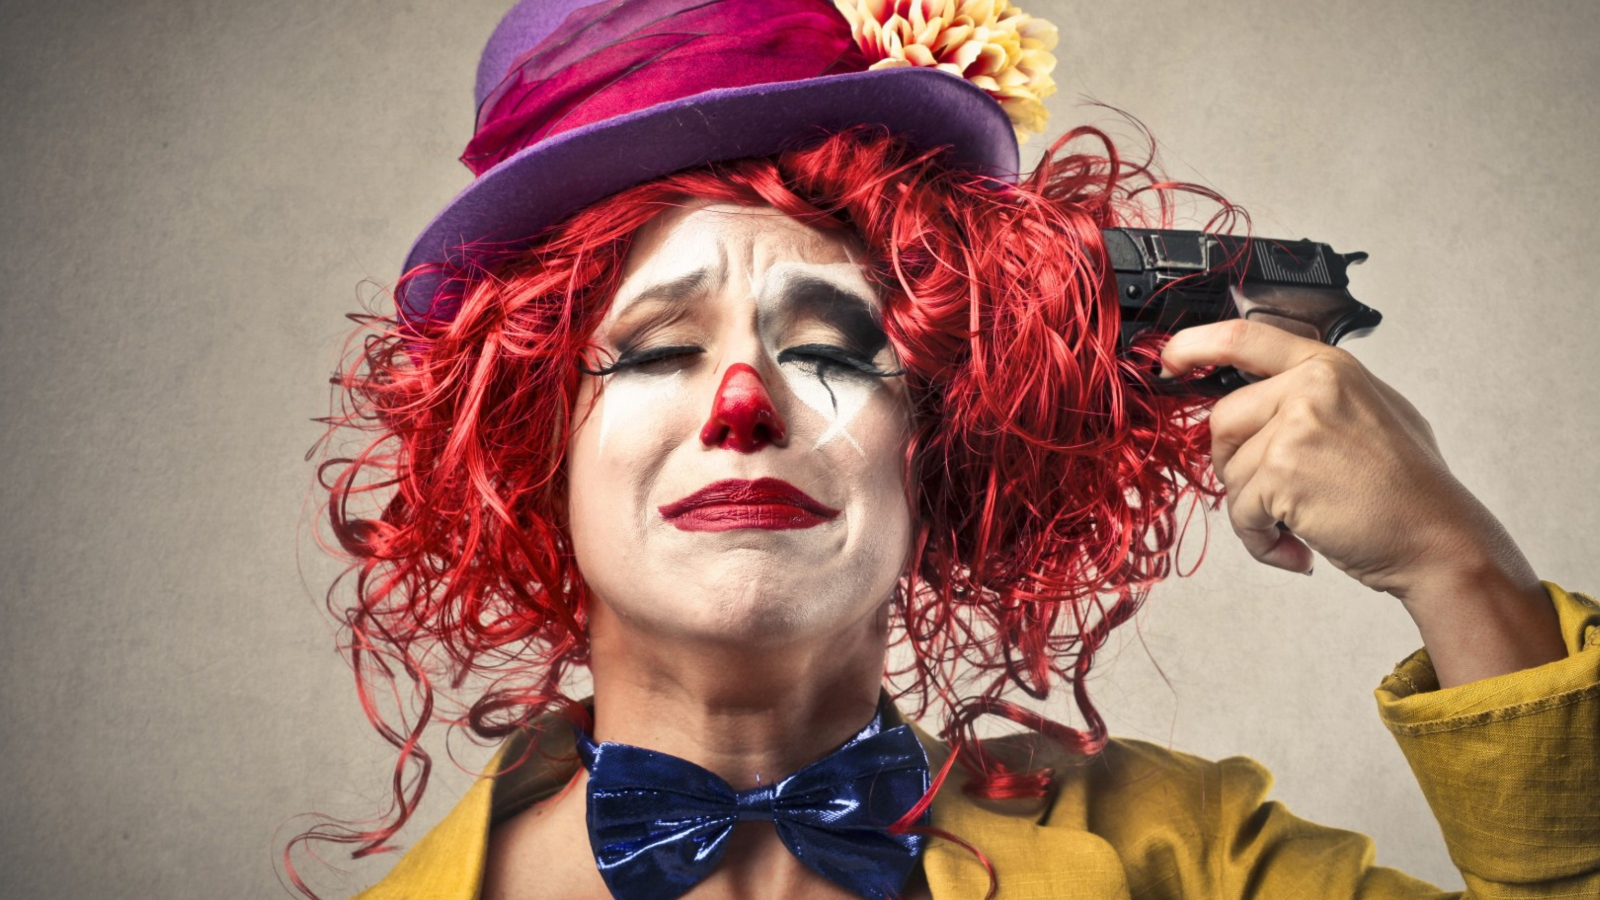 sad clown face image picture code